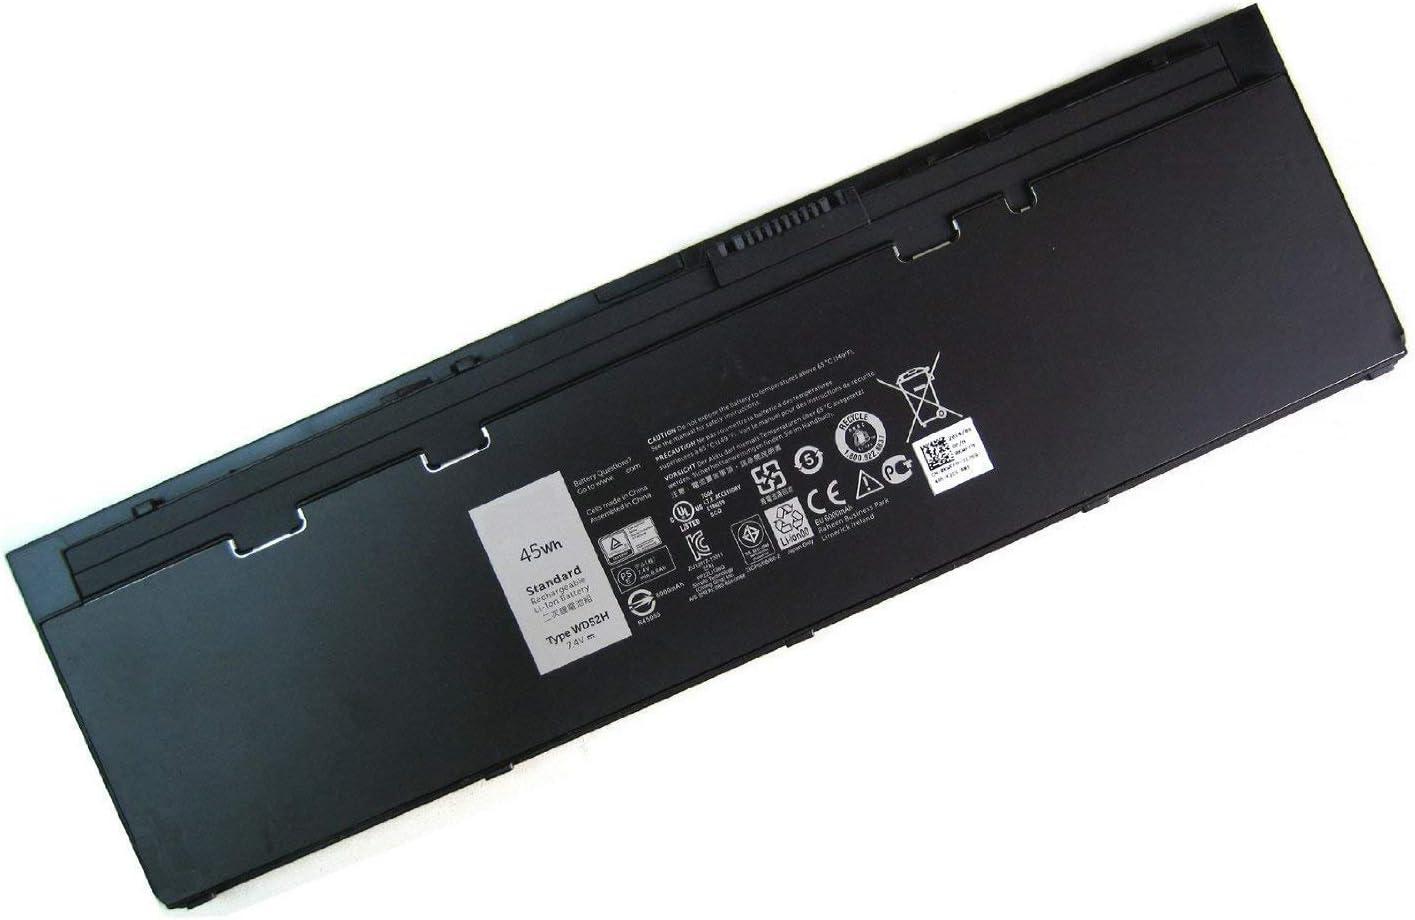 SERNN WD52H Replacement Laptop Battery (7.4V 45Wh) for DELL Latitude F3G33 E7240 VFV59 KWFFN J31N7 451-BBFW 451-BBFX GD076 GVD76 HJ8KP NCVF0